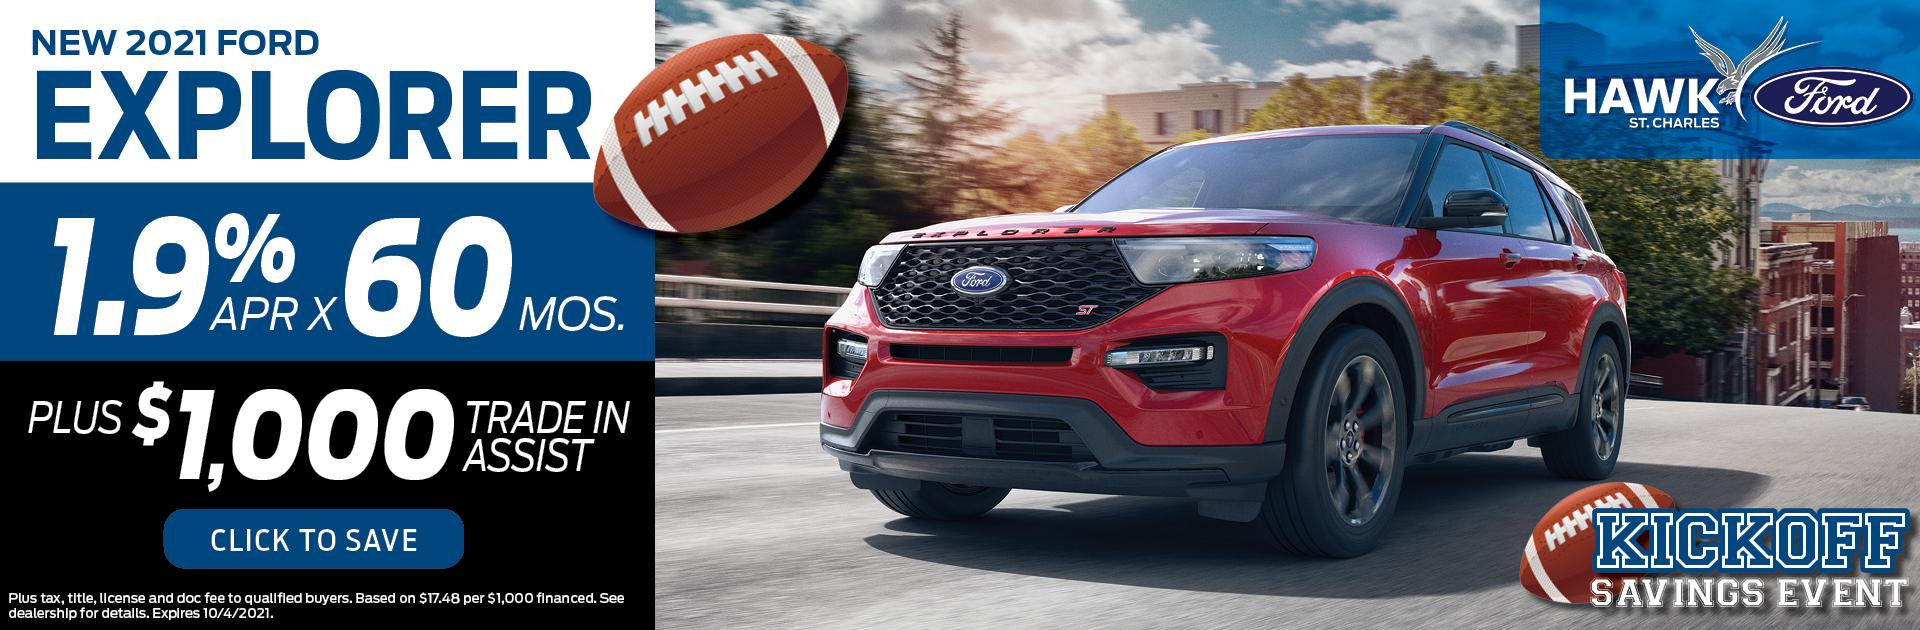 2021 Ford Explorer Finance Offer | Hawk Ford of St. Charles